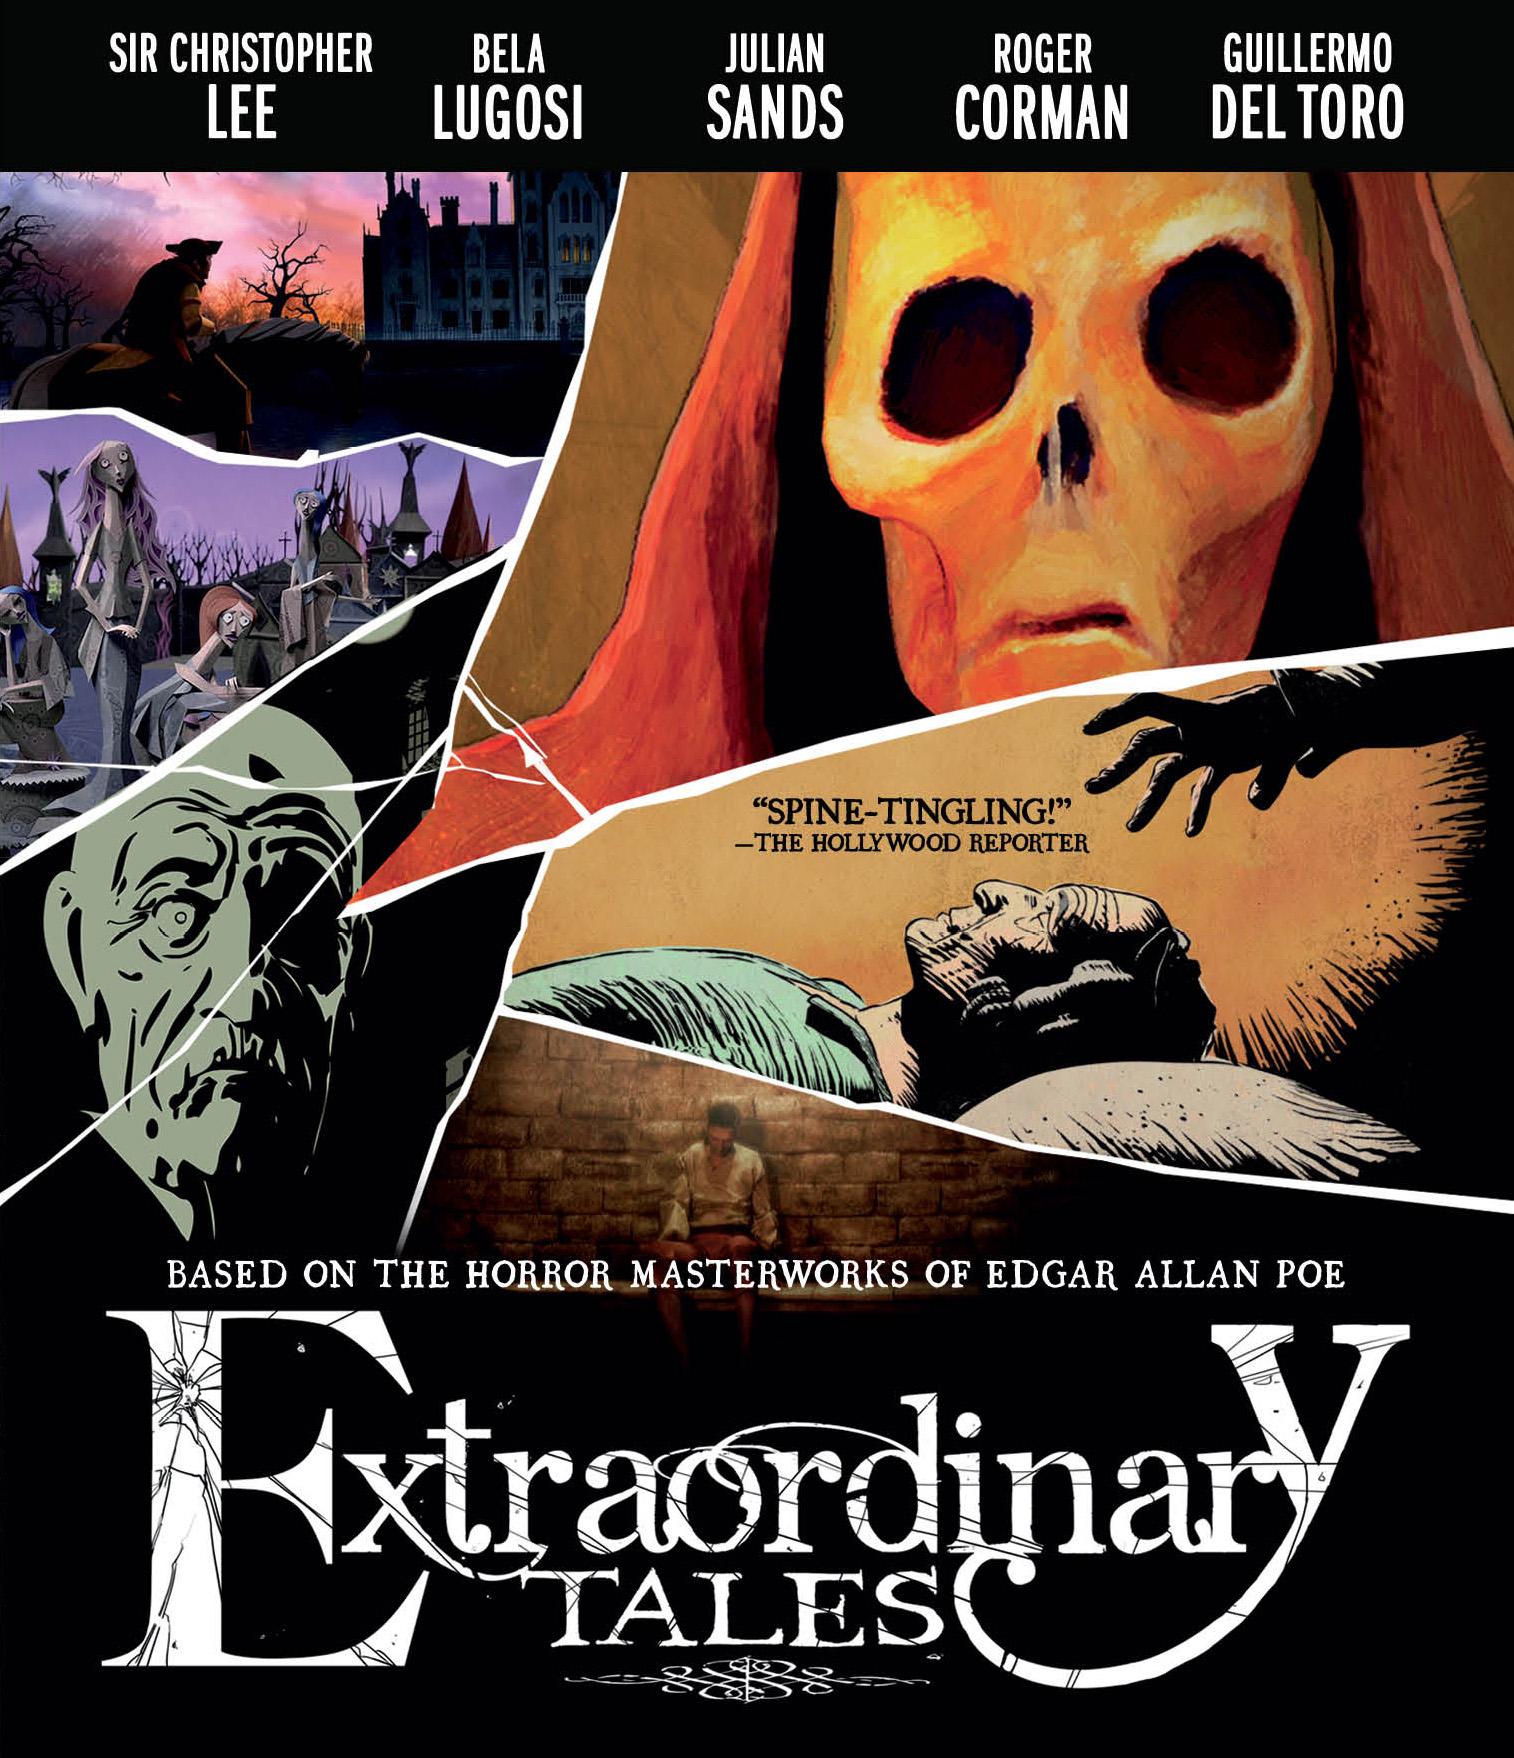 Extraordinary Tales [blu-ray] [2 Discs] 4759818